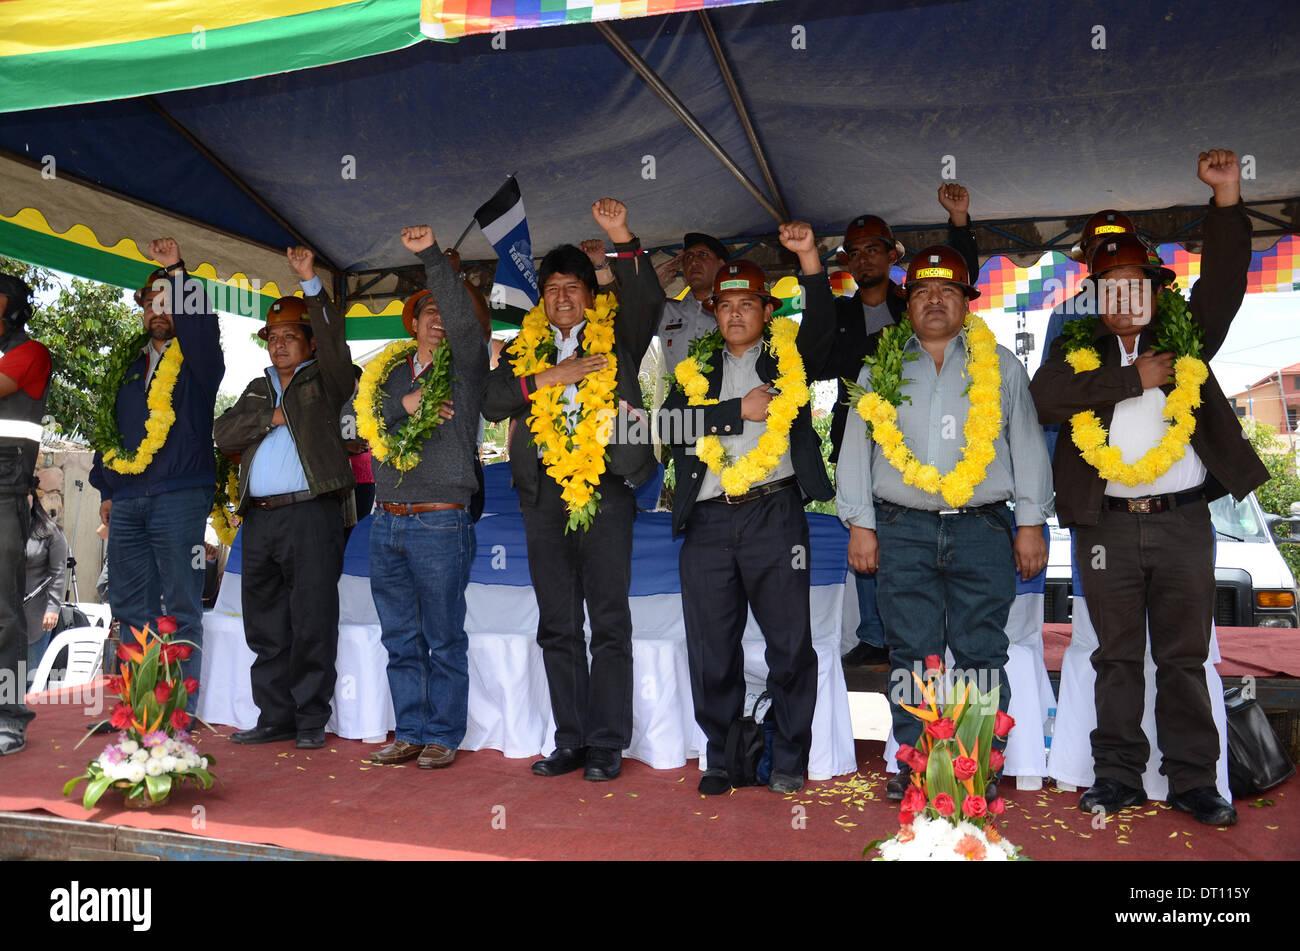 Cochabamba, Bolivia. 5th Feb, 2014. Bolivia's President Evo Morales (C) attends the handover ceremony of the new headquarters of the Cochabamba Federation of Mining Cooperatives in Cochabamba, Bolivia, on Feb. 5, 2014. Credit:  R. Zaconeta/ABI/Xinhua/Alamy Live News - Stock Image